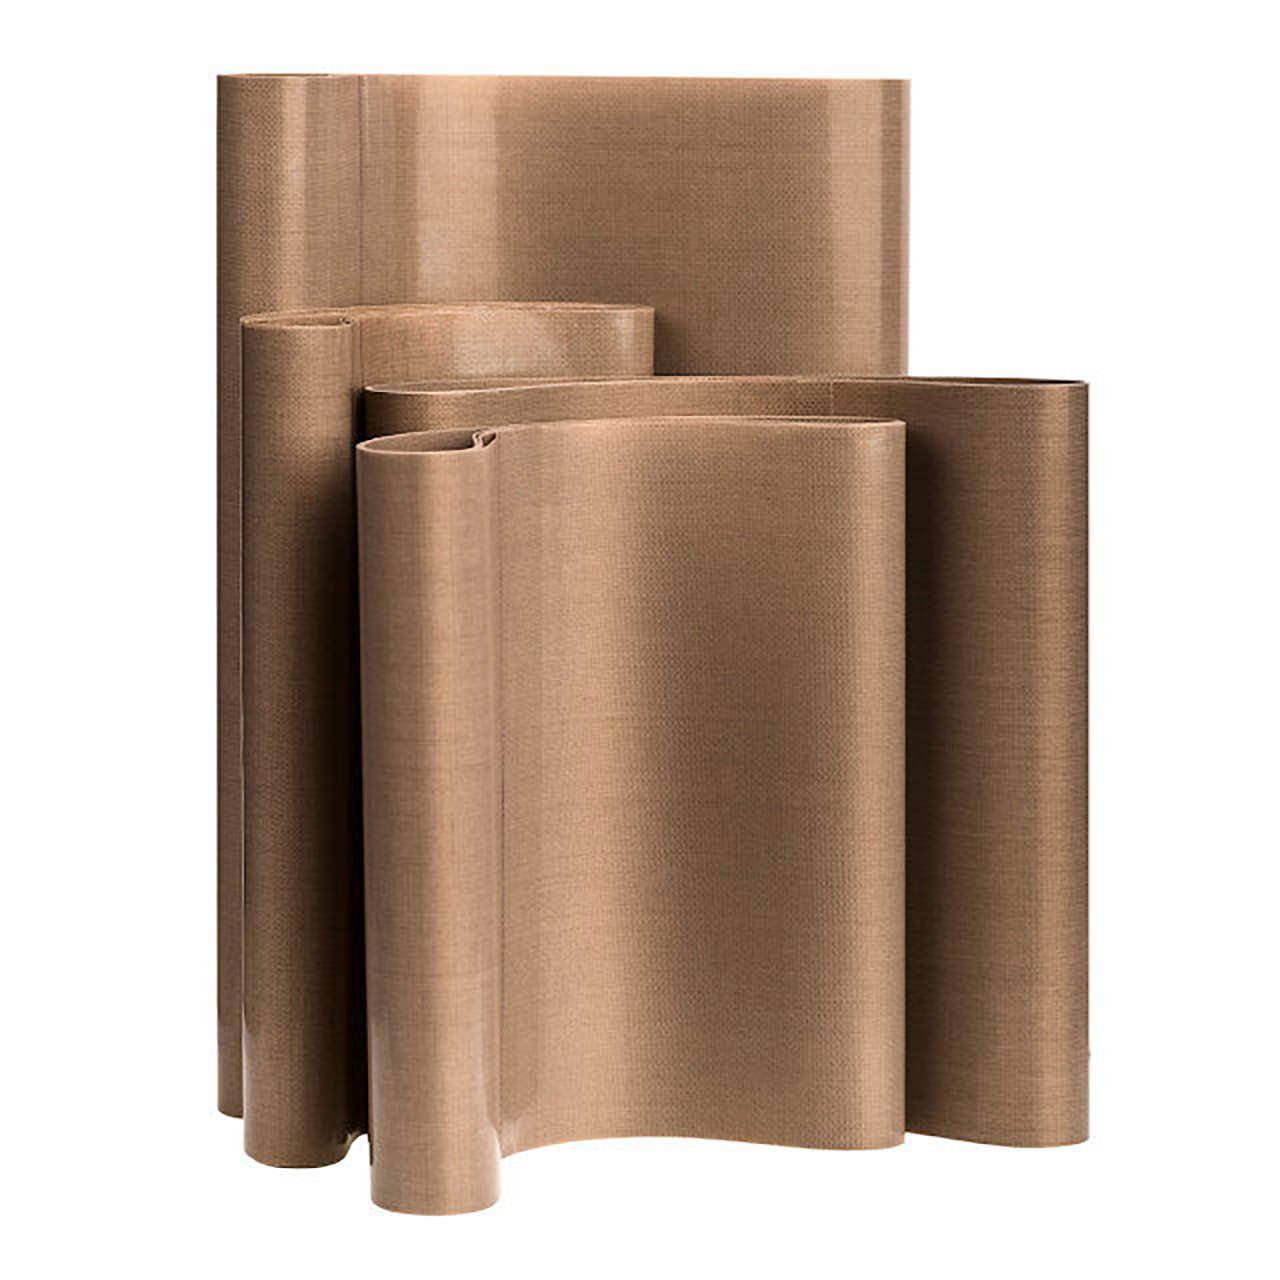 Тефлоновый ремень 400х620 мм для сварки ПВХ